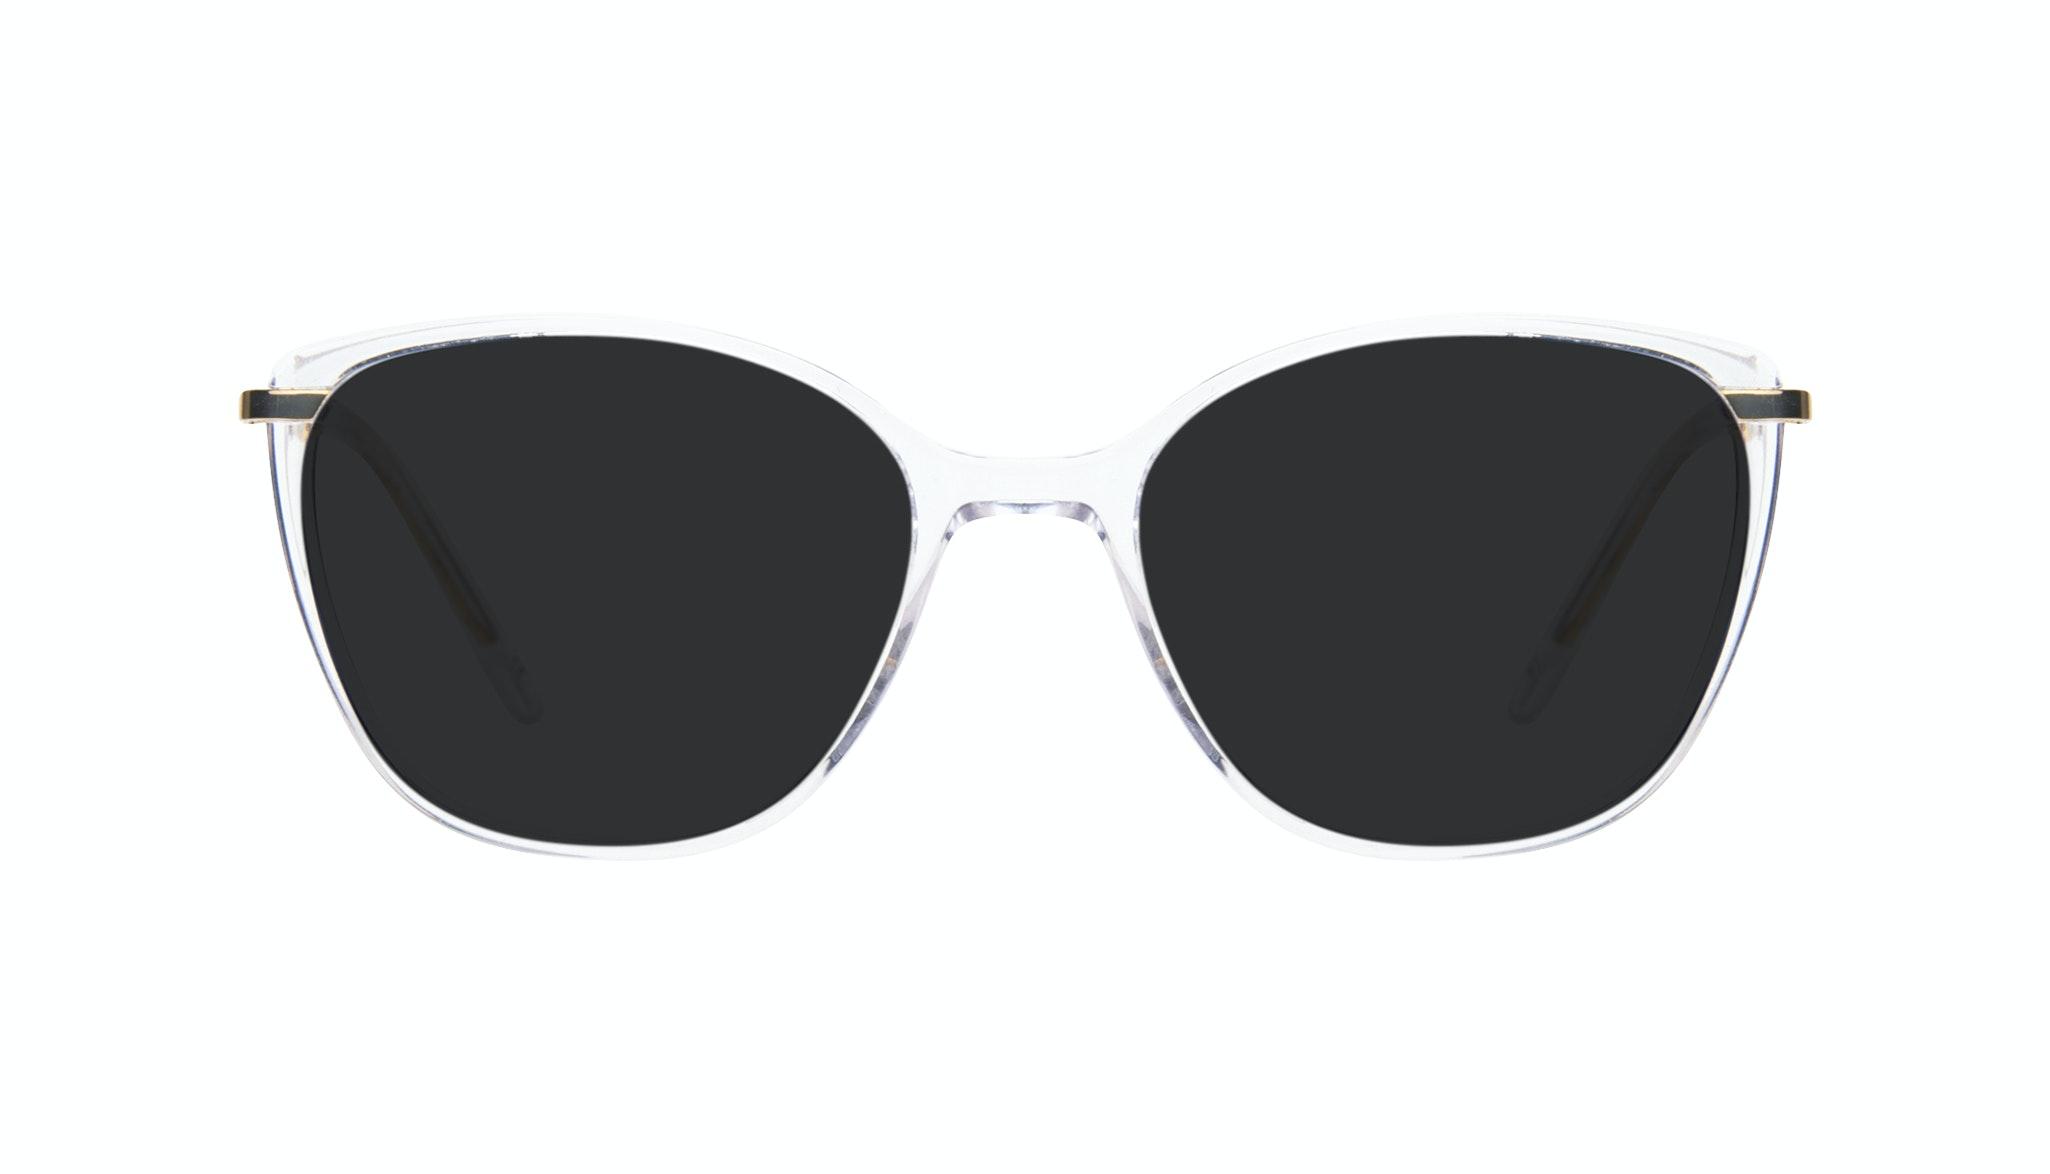 Affordable Fashion Glasses Cat Eye Rectangle Square Sunglasses Women Illusion Gold Diamond Front